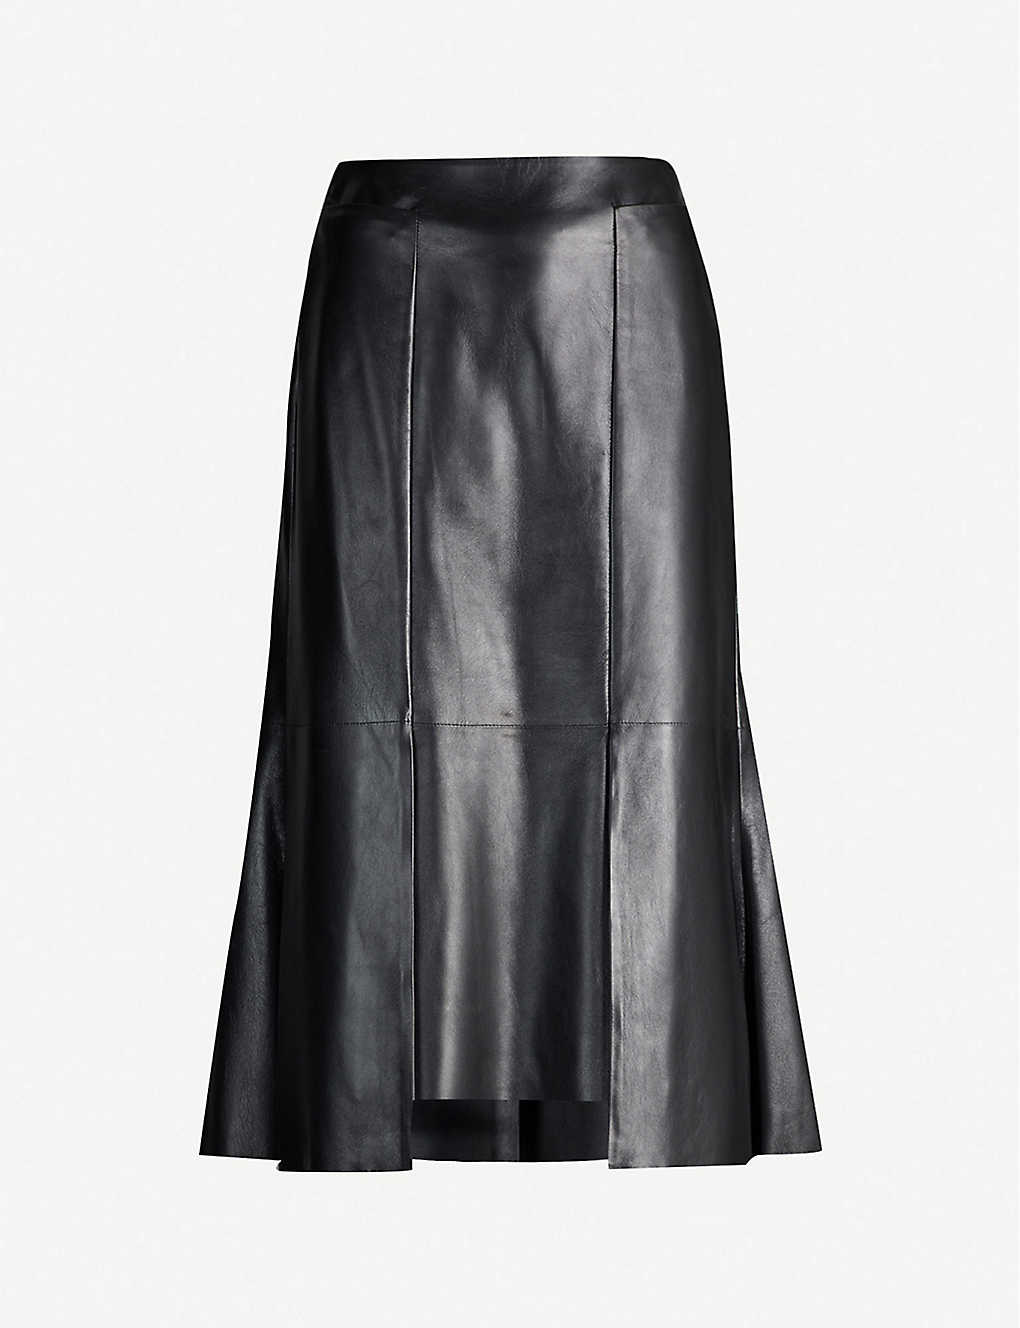 0db8b4815 ALEXANDER MCQUEEN - High-waisted leather midi skirt | Selfridges.com